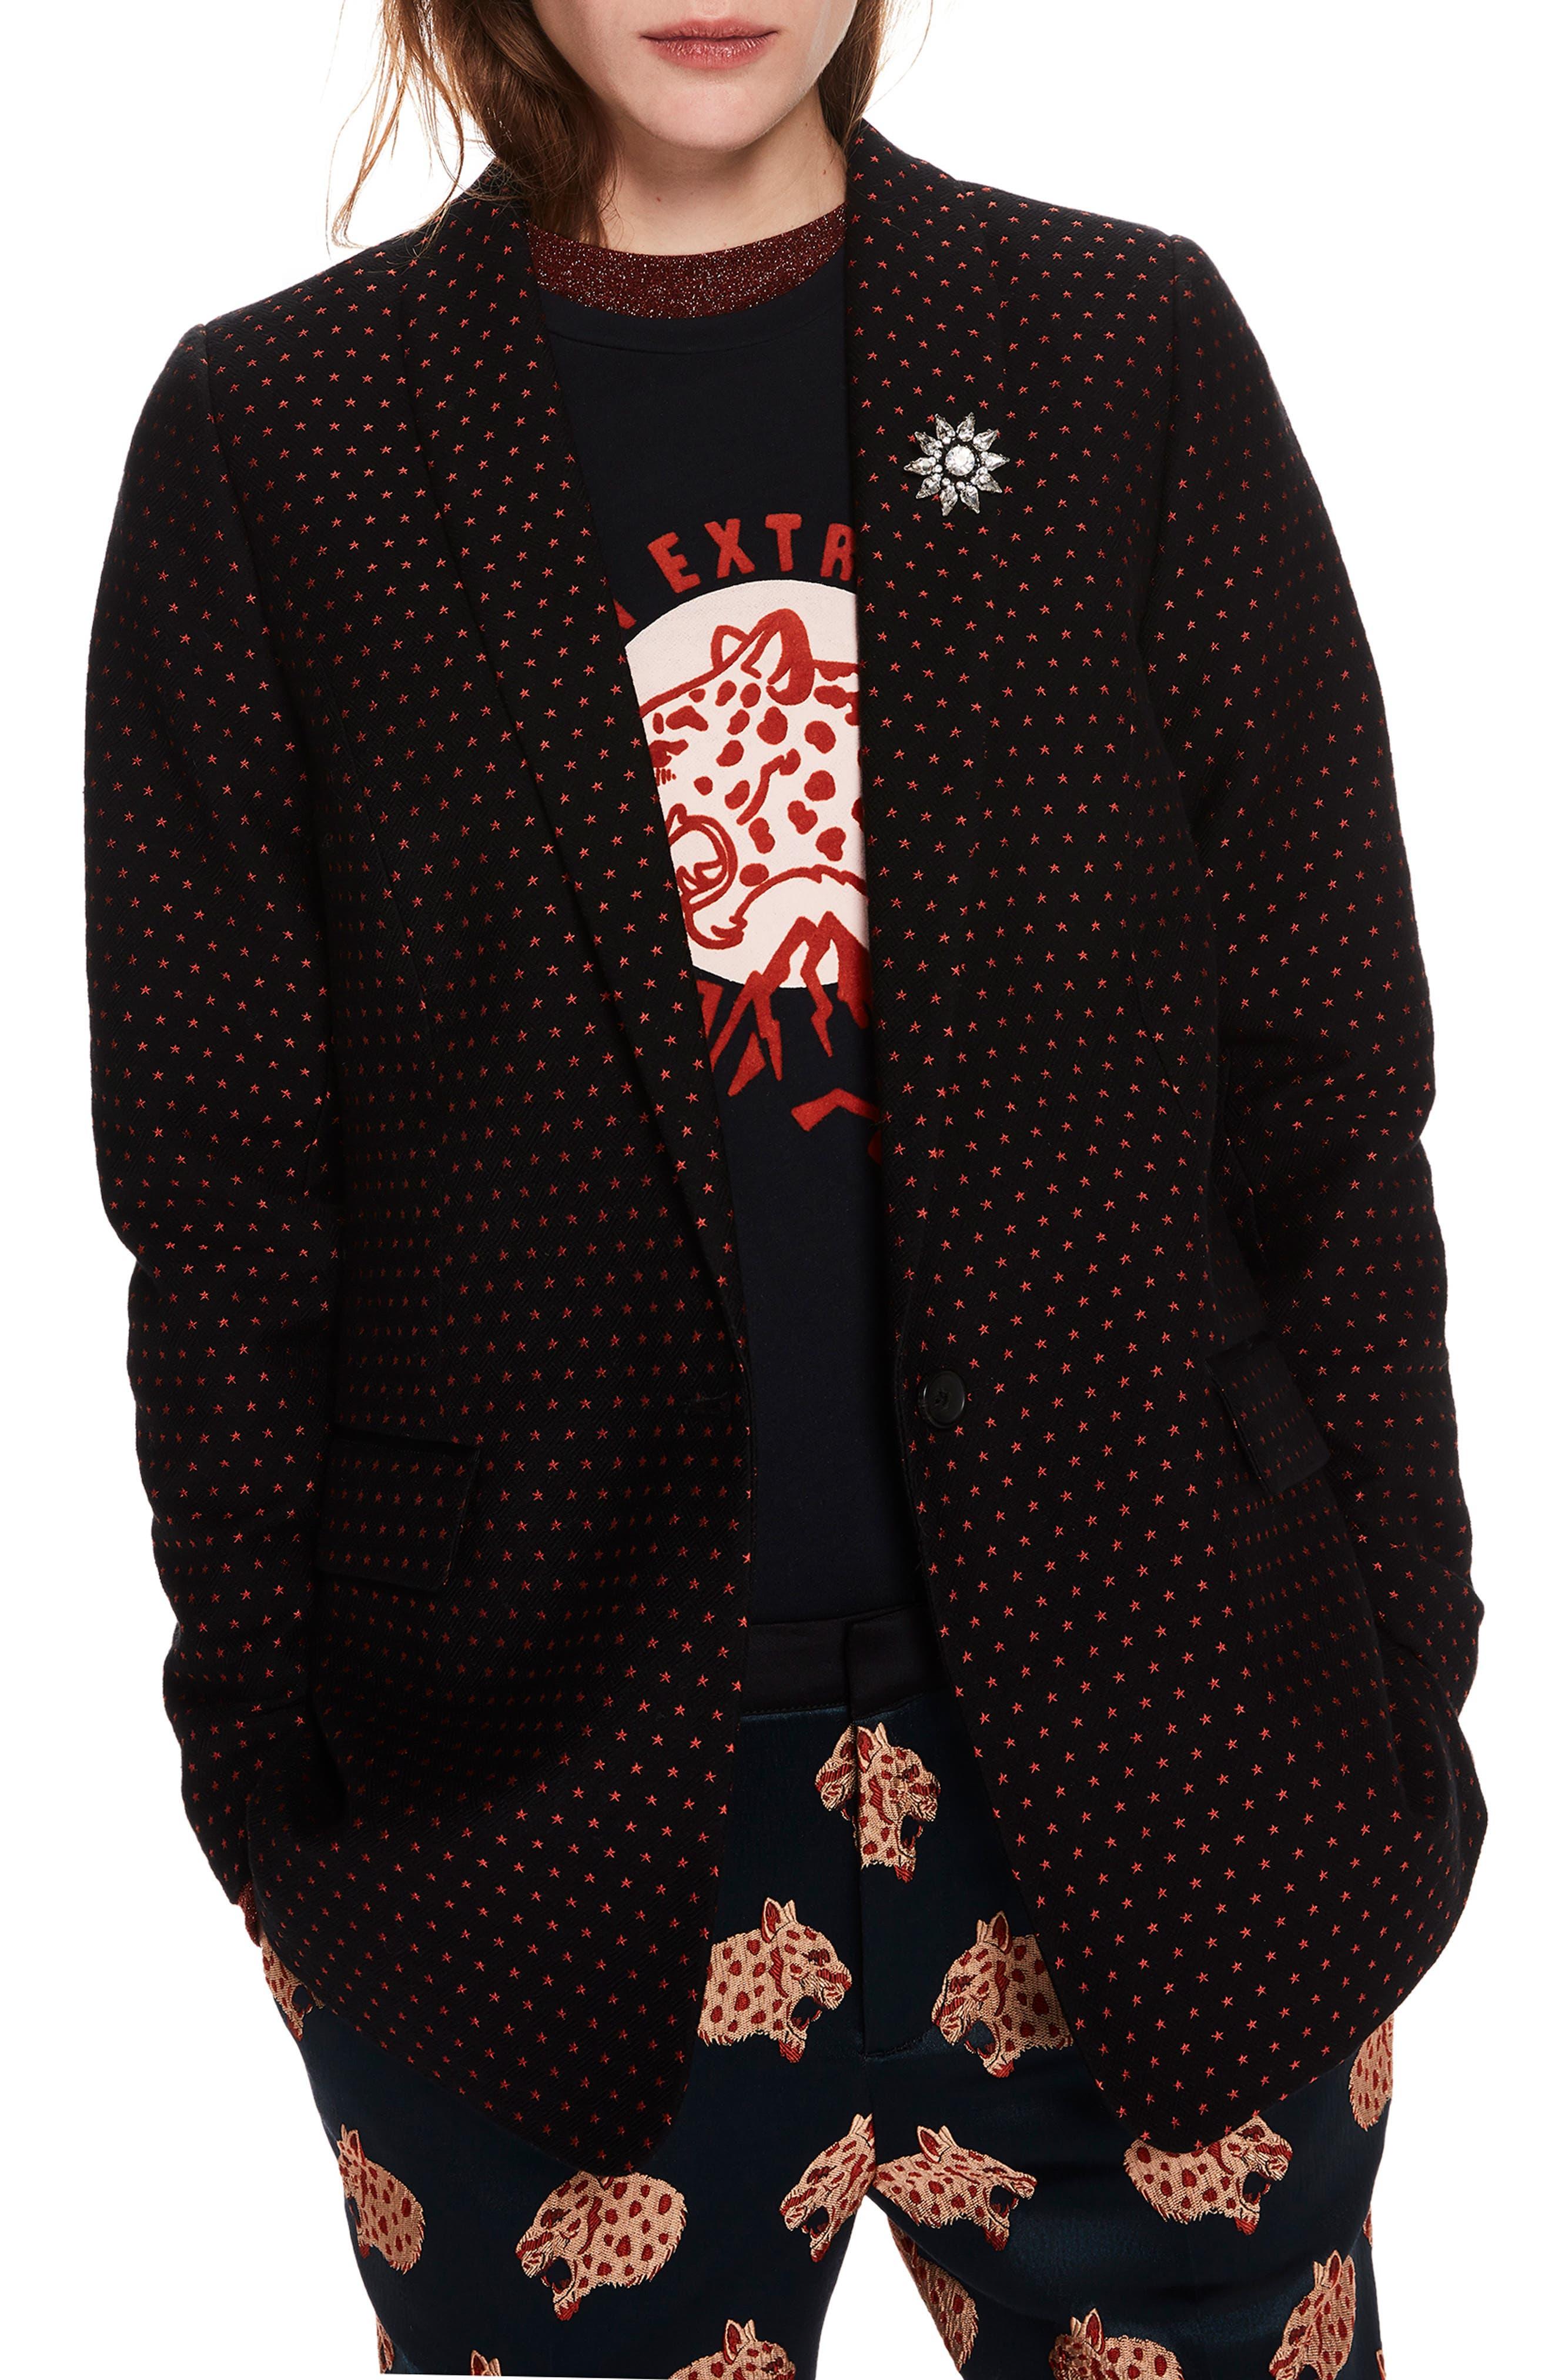 SCOTCH & SODA Tailored Stretch Jacquard Blazer, Main, color, BLACK W/ SMALL STAR PRINT